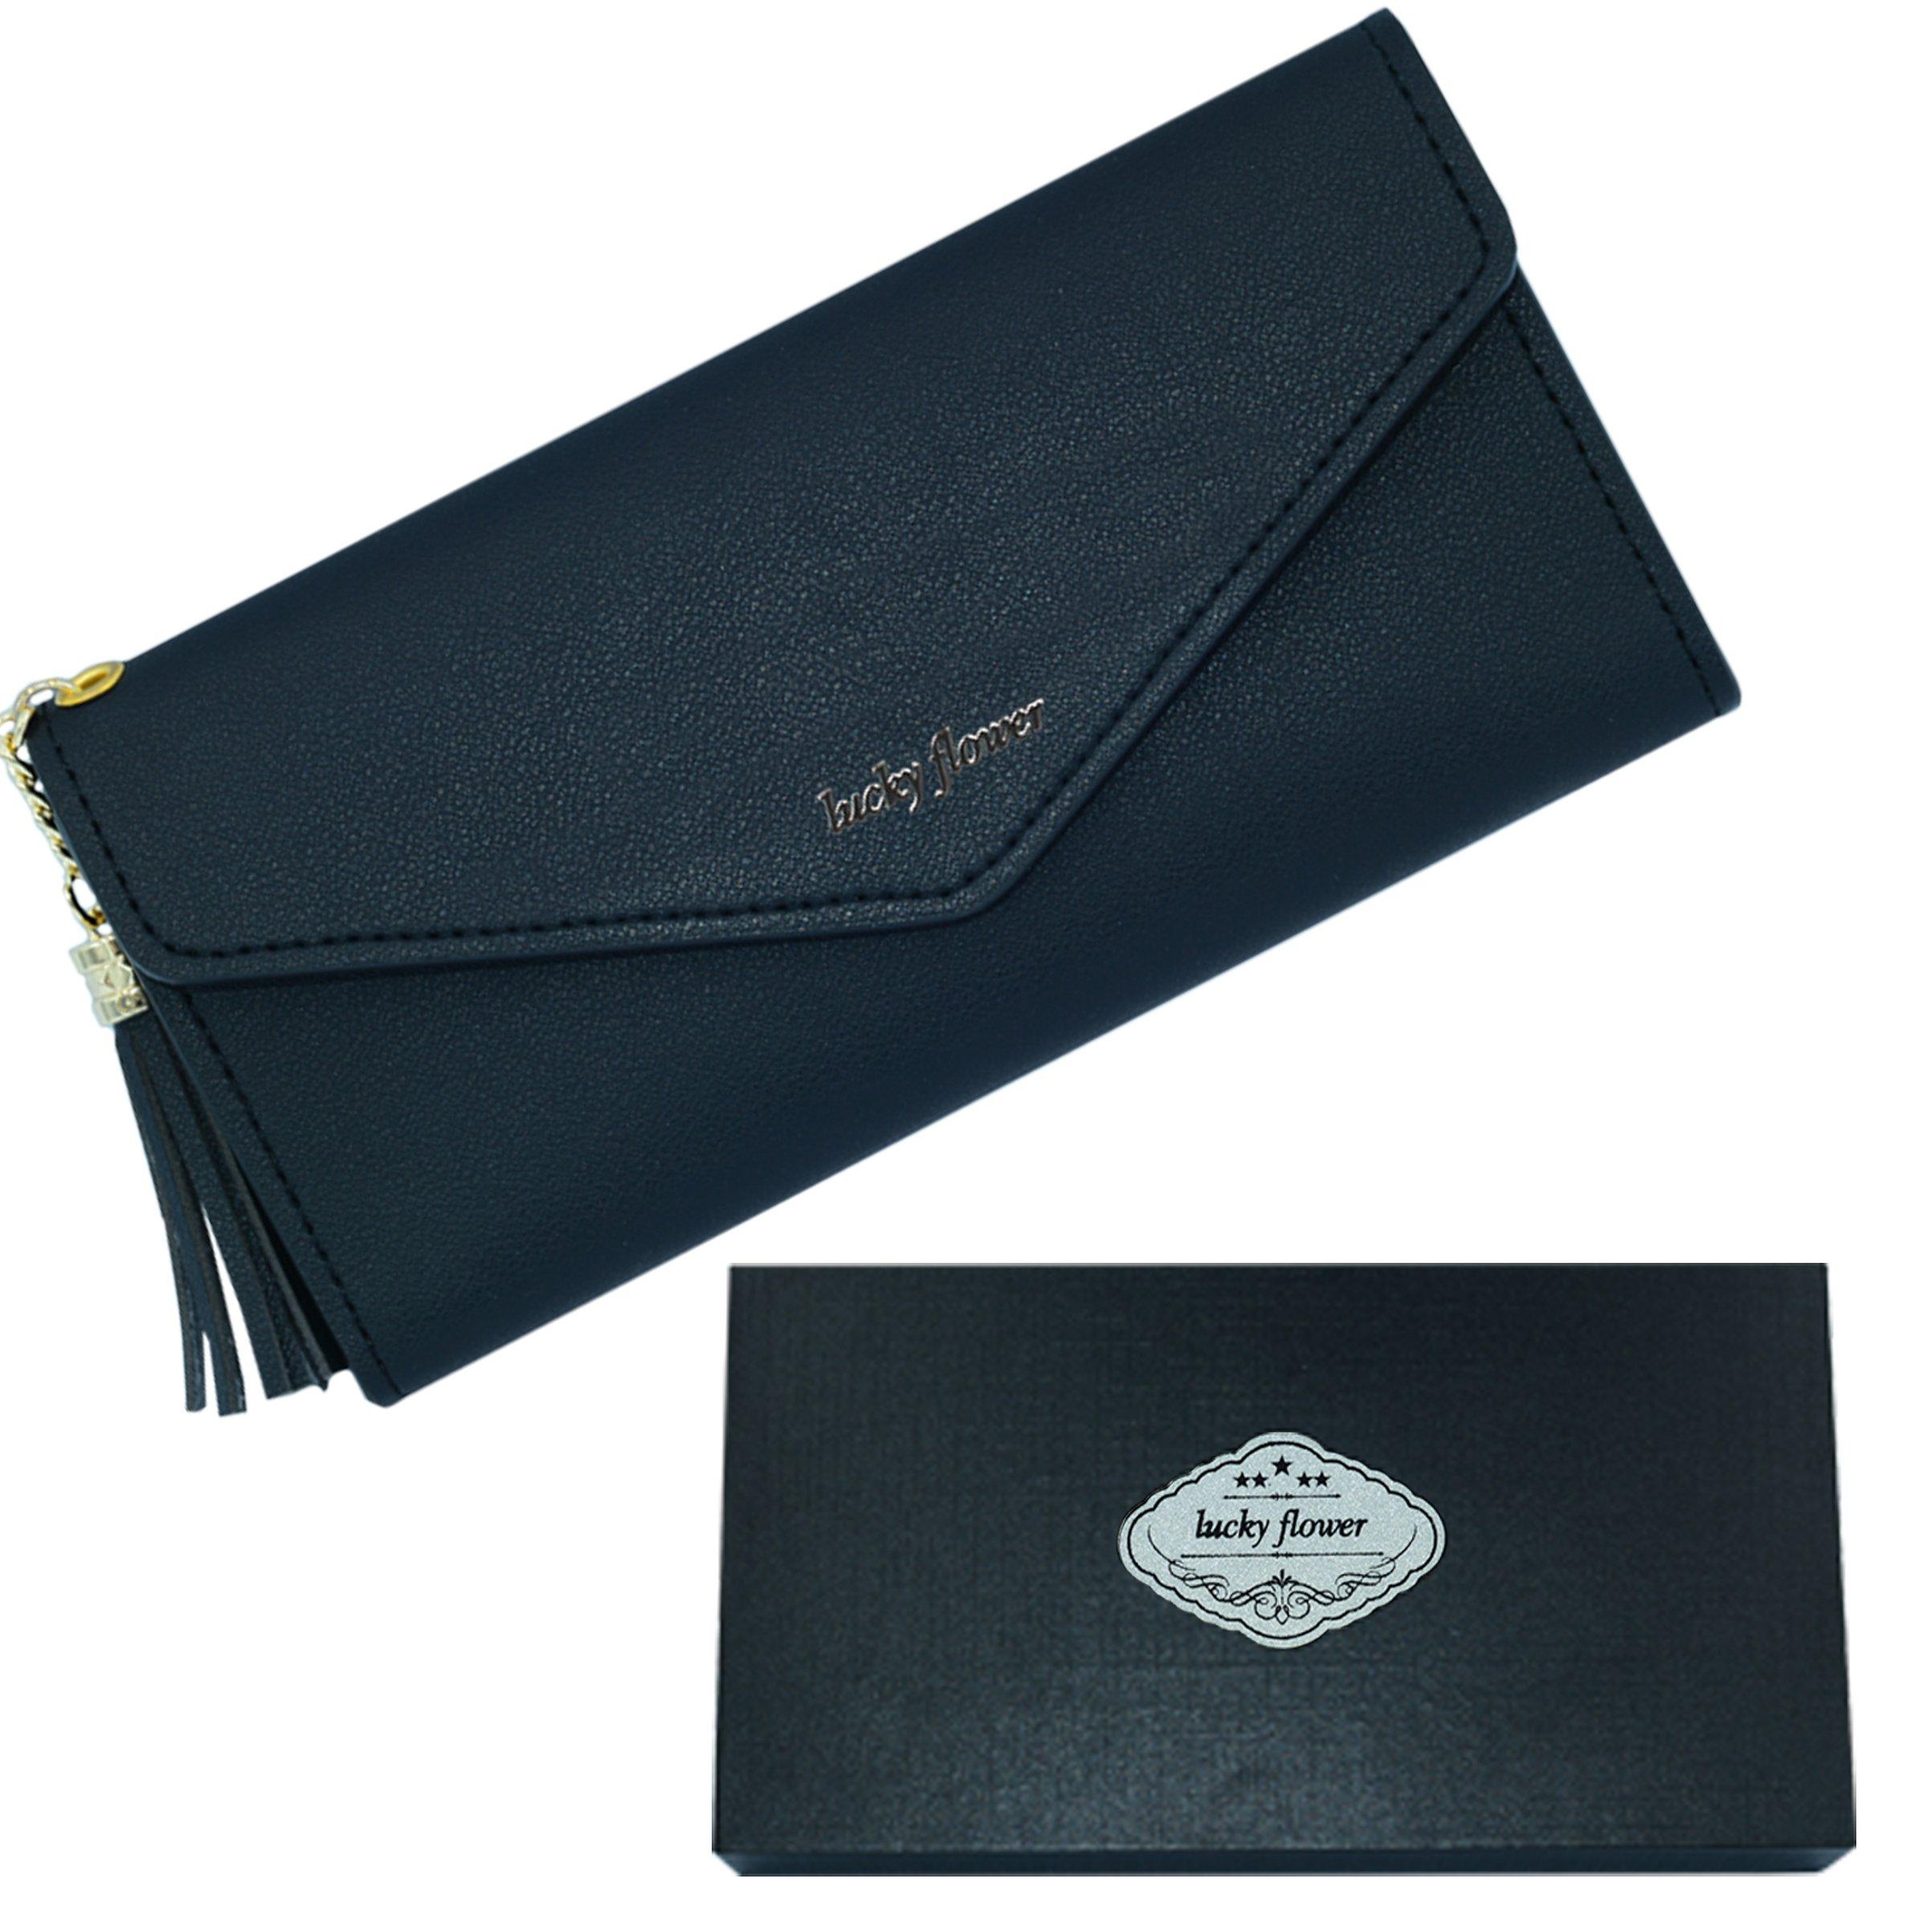 LUCKY FLOWER Travel Wallet Passport Holder, Leather Credit Card Holder Clutch Purse With Zipper Pocket (Black) …